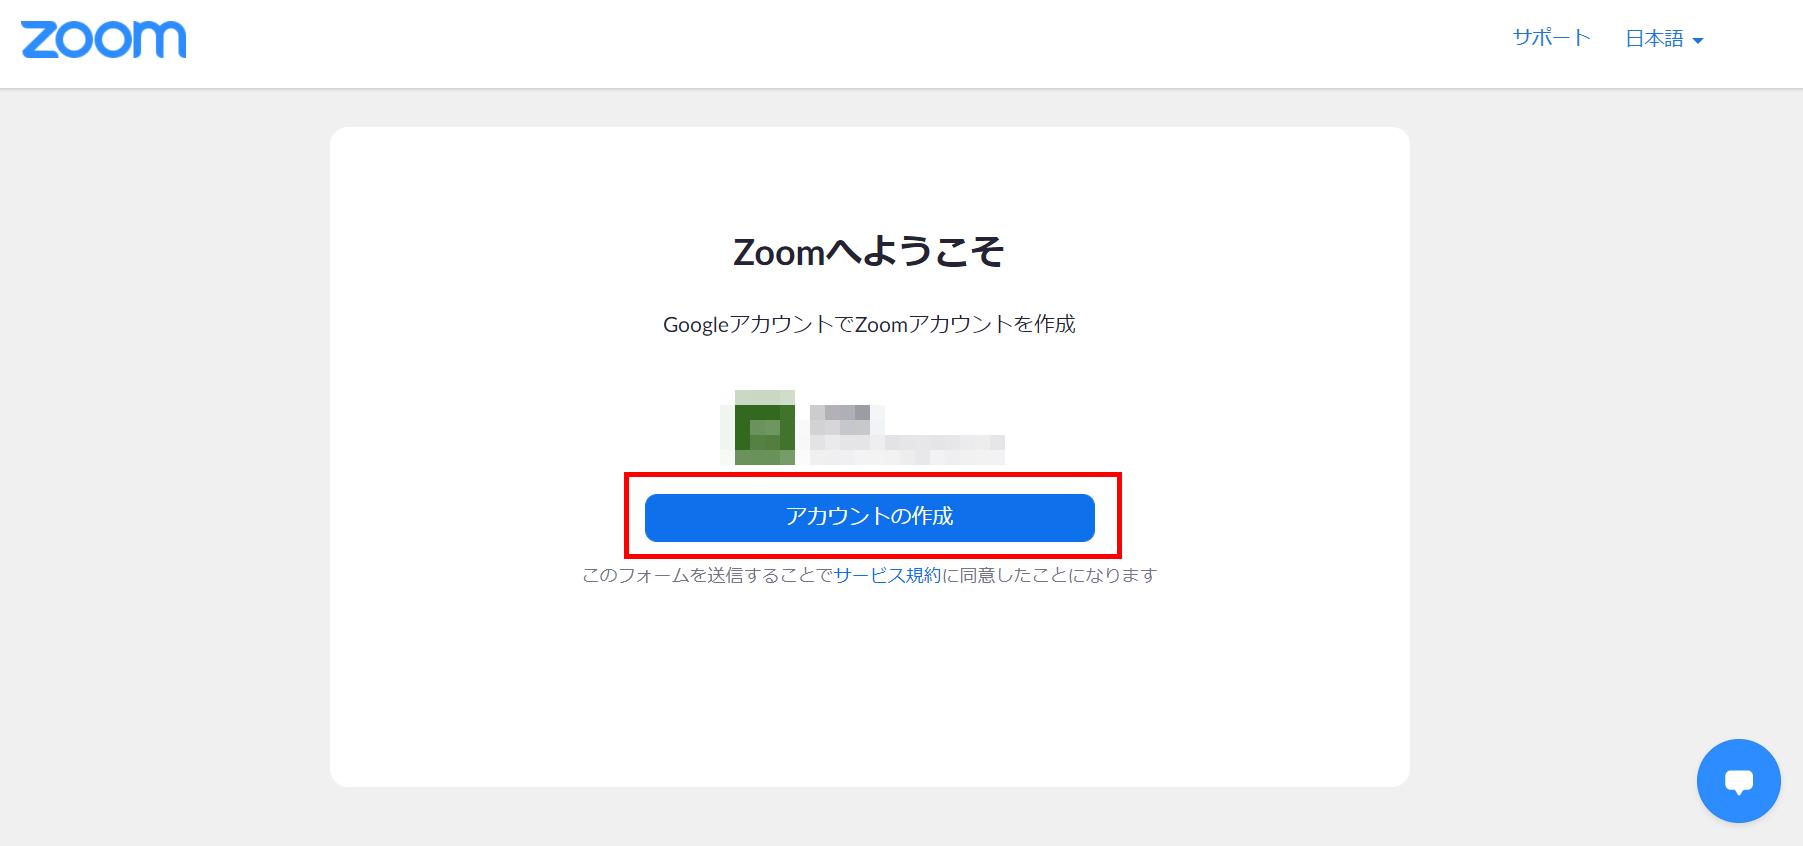 Zoomのアカウントを作成する方法12